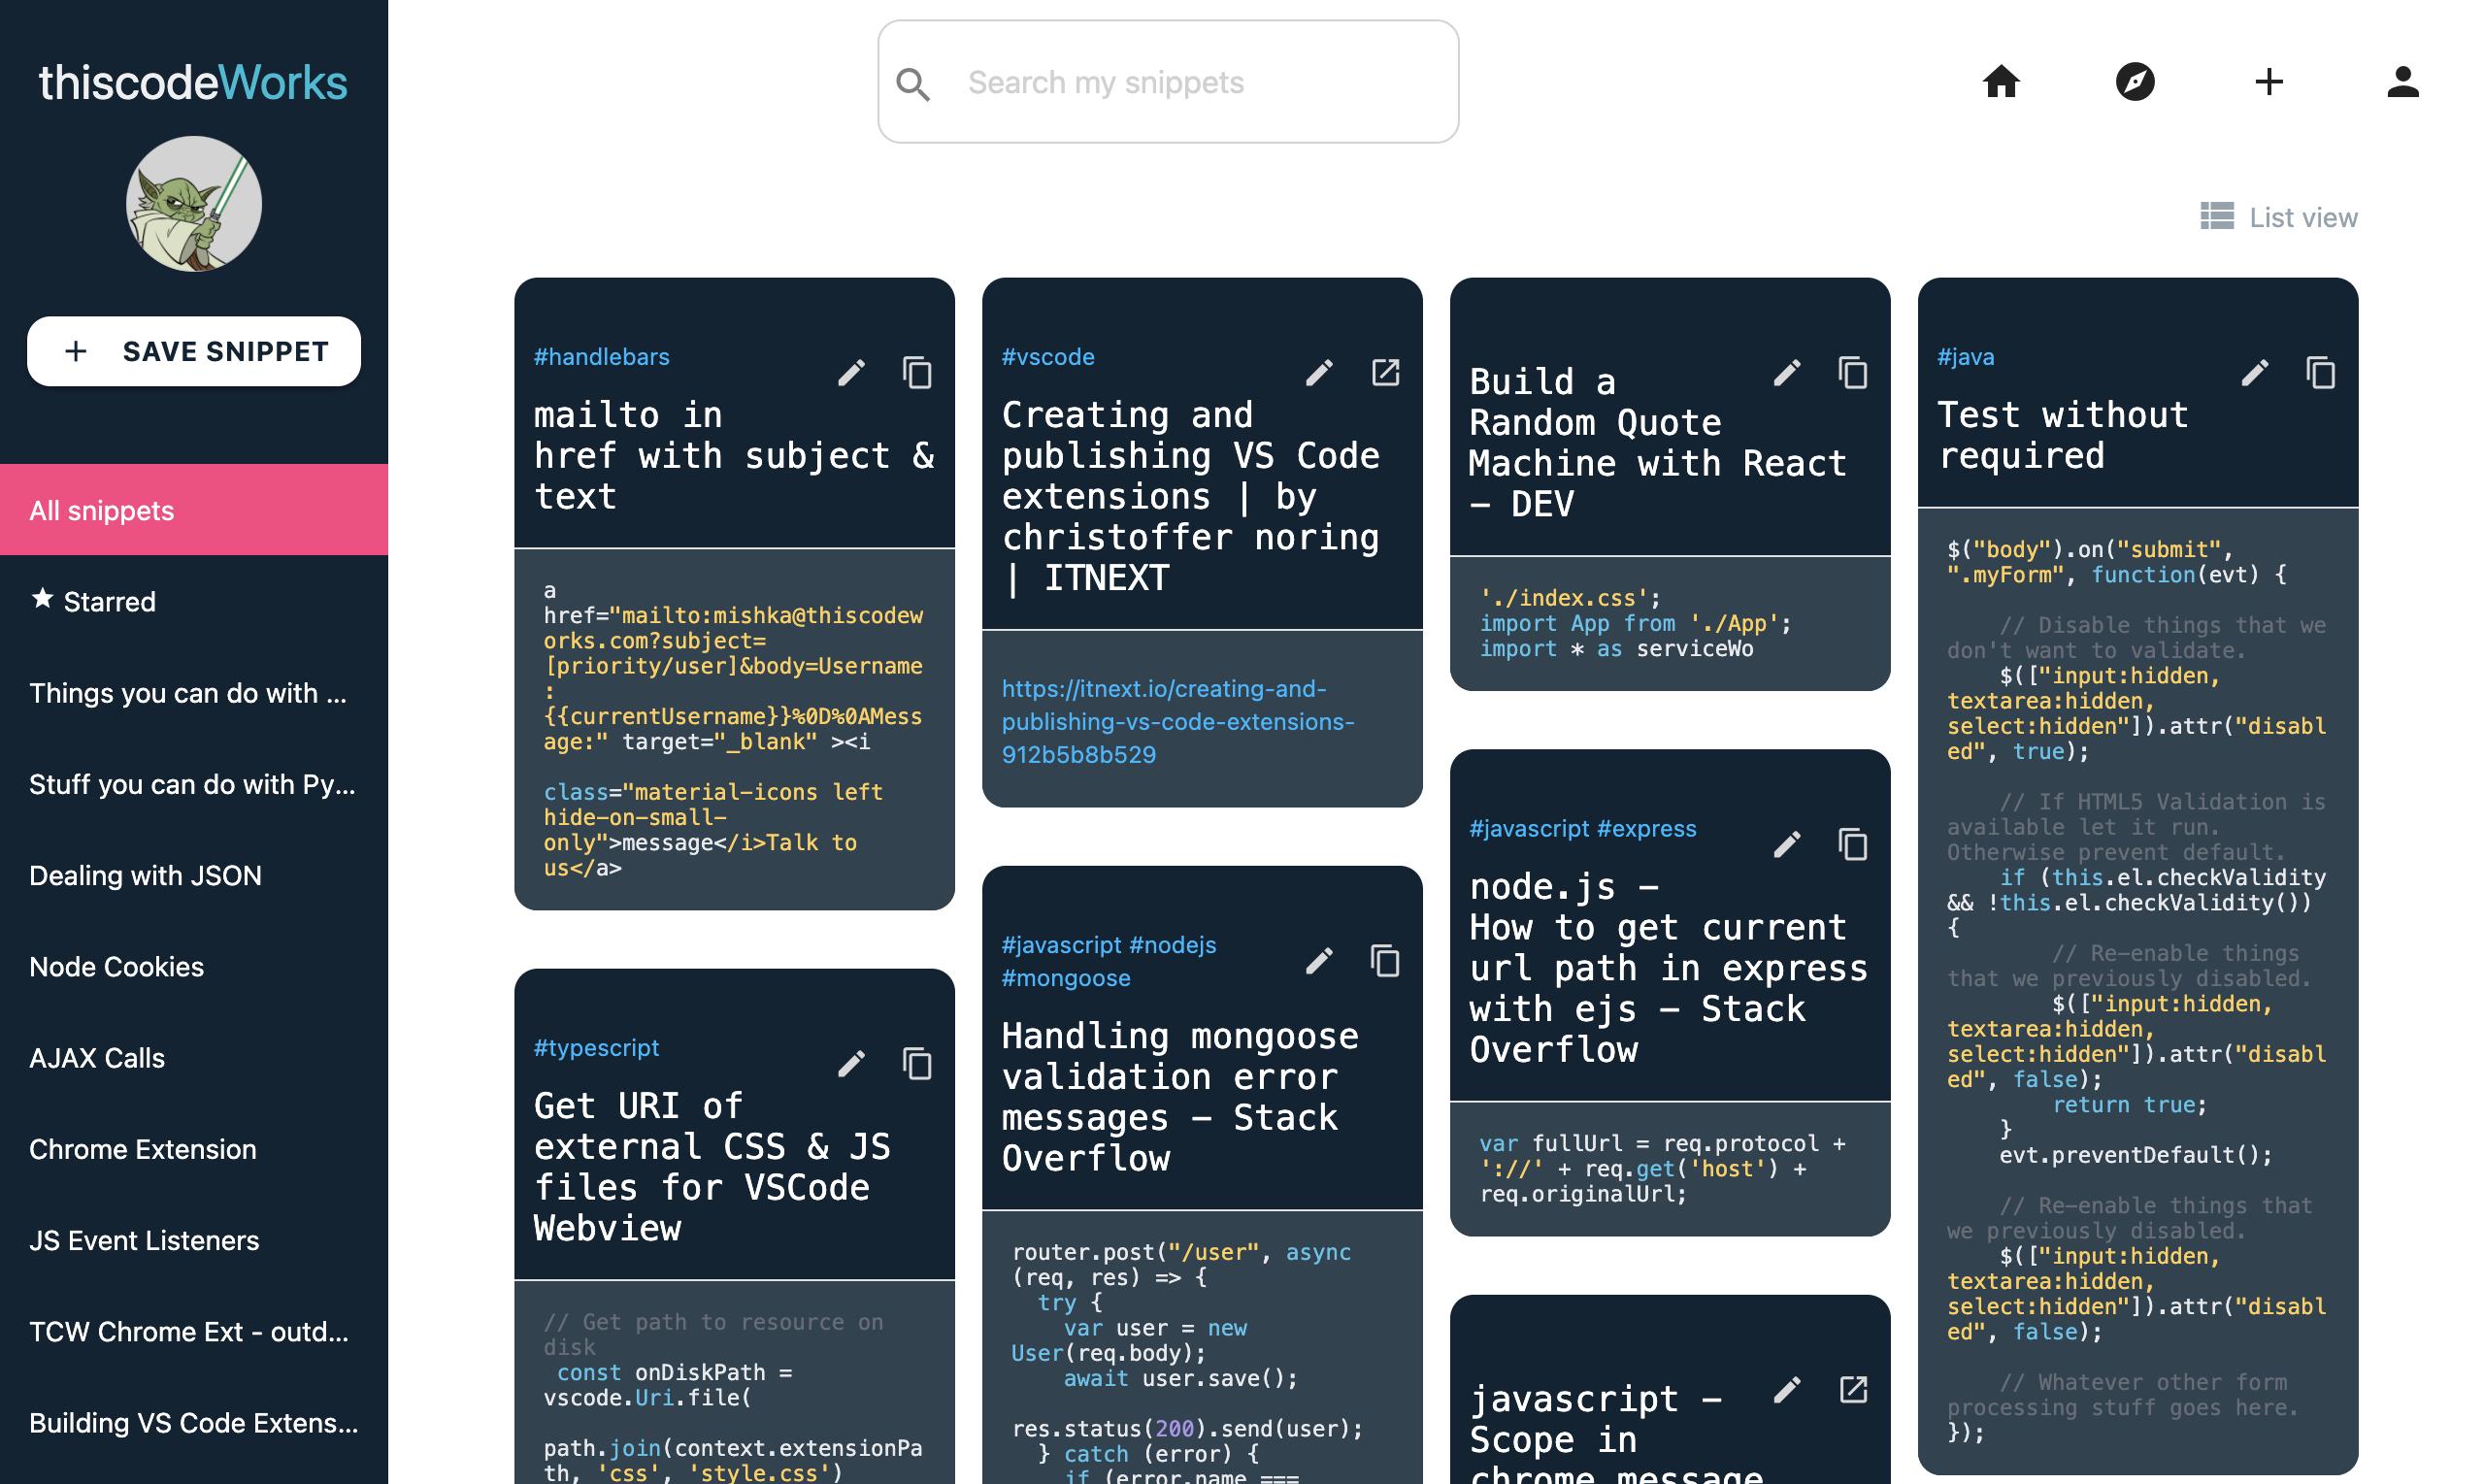 Mishka Taskable User Spotlight: thiscodeworks dashboard